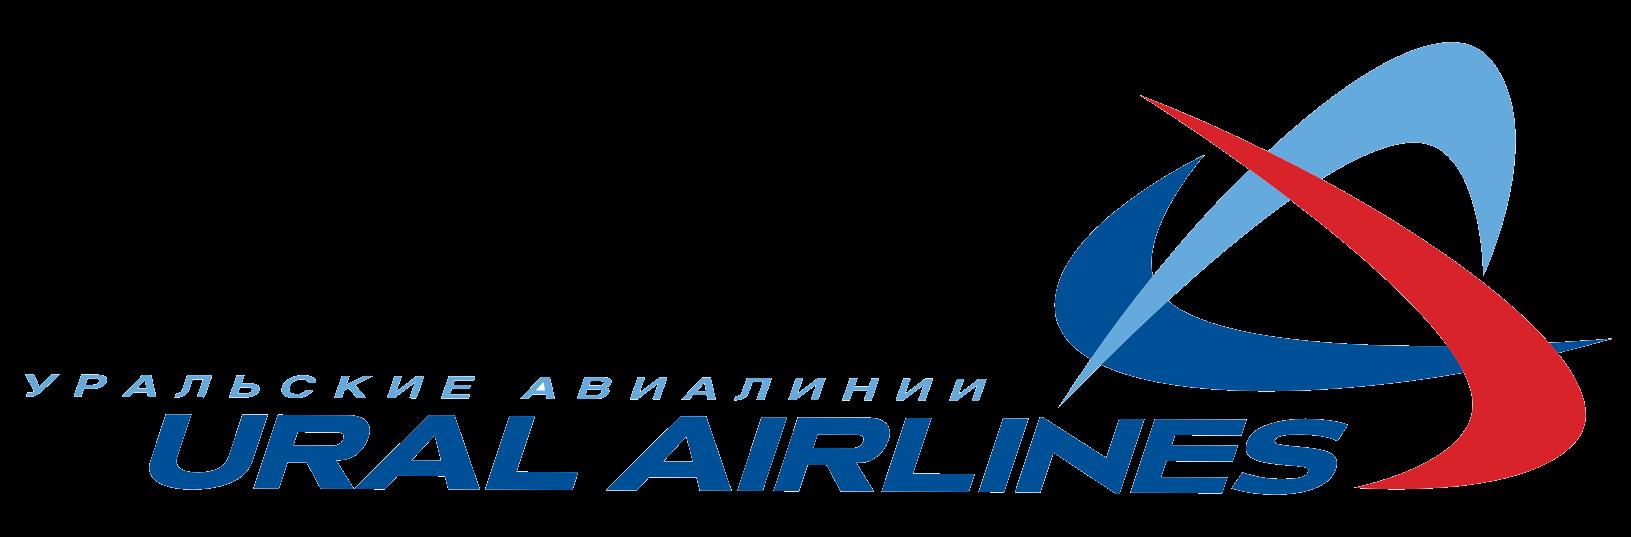 Логотип Ural Airlines